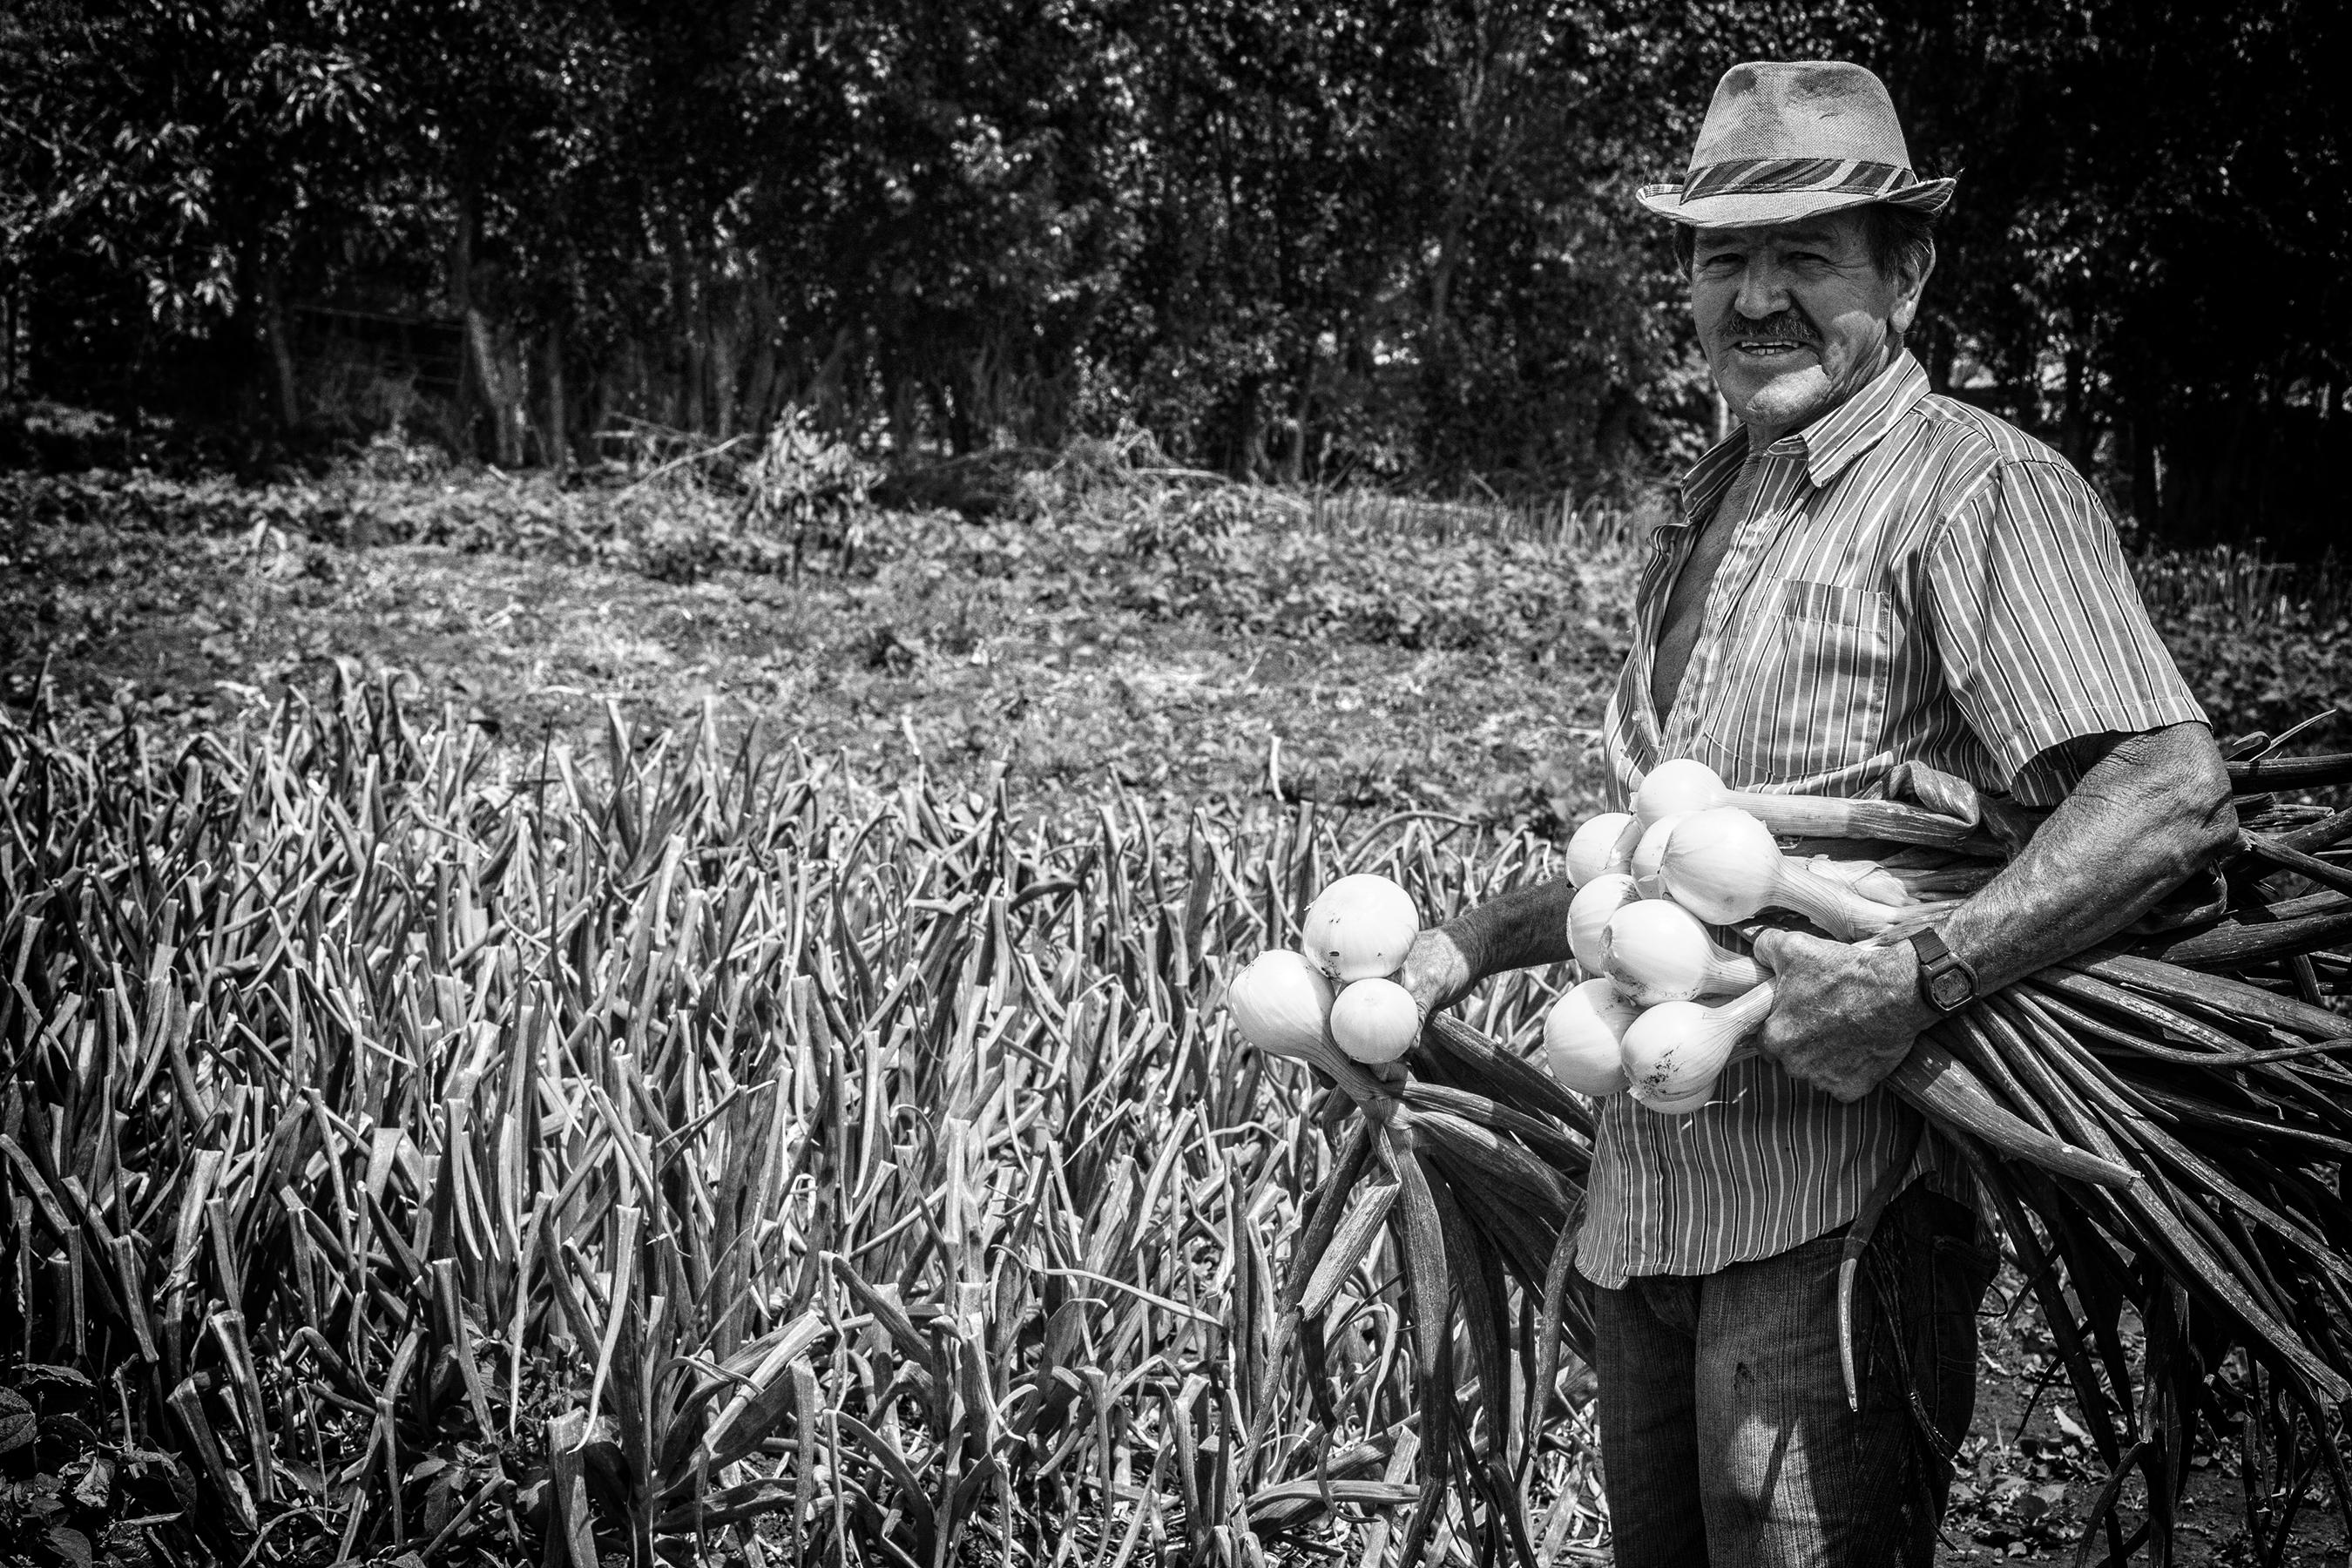 Agricultor